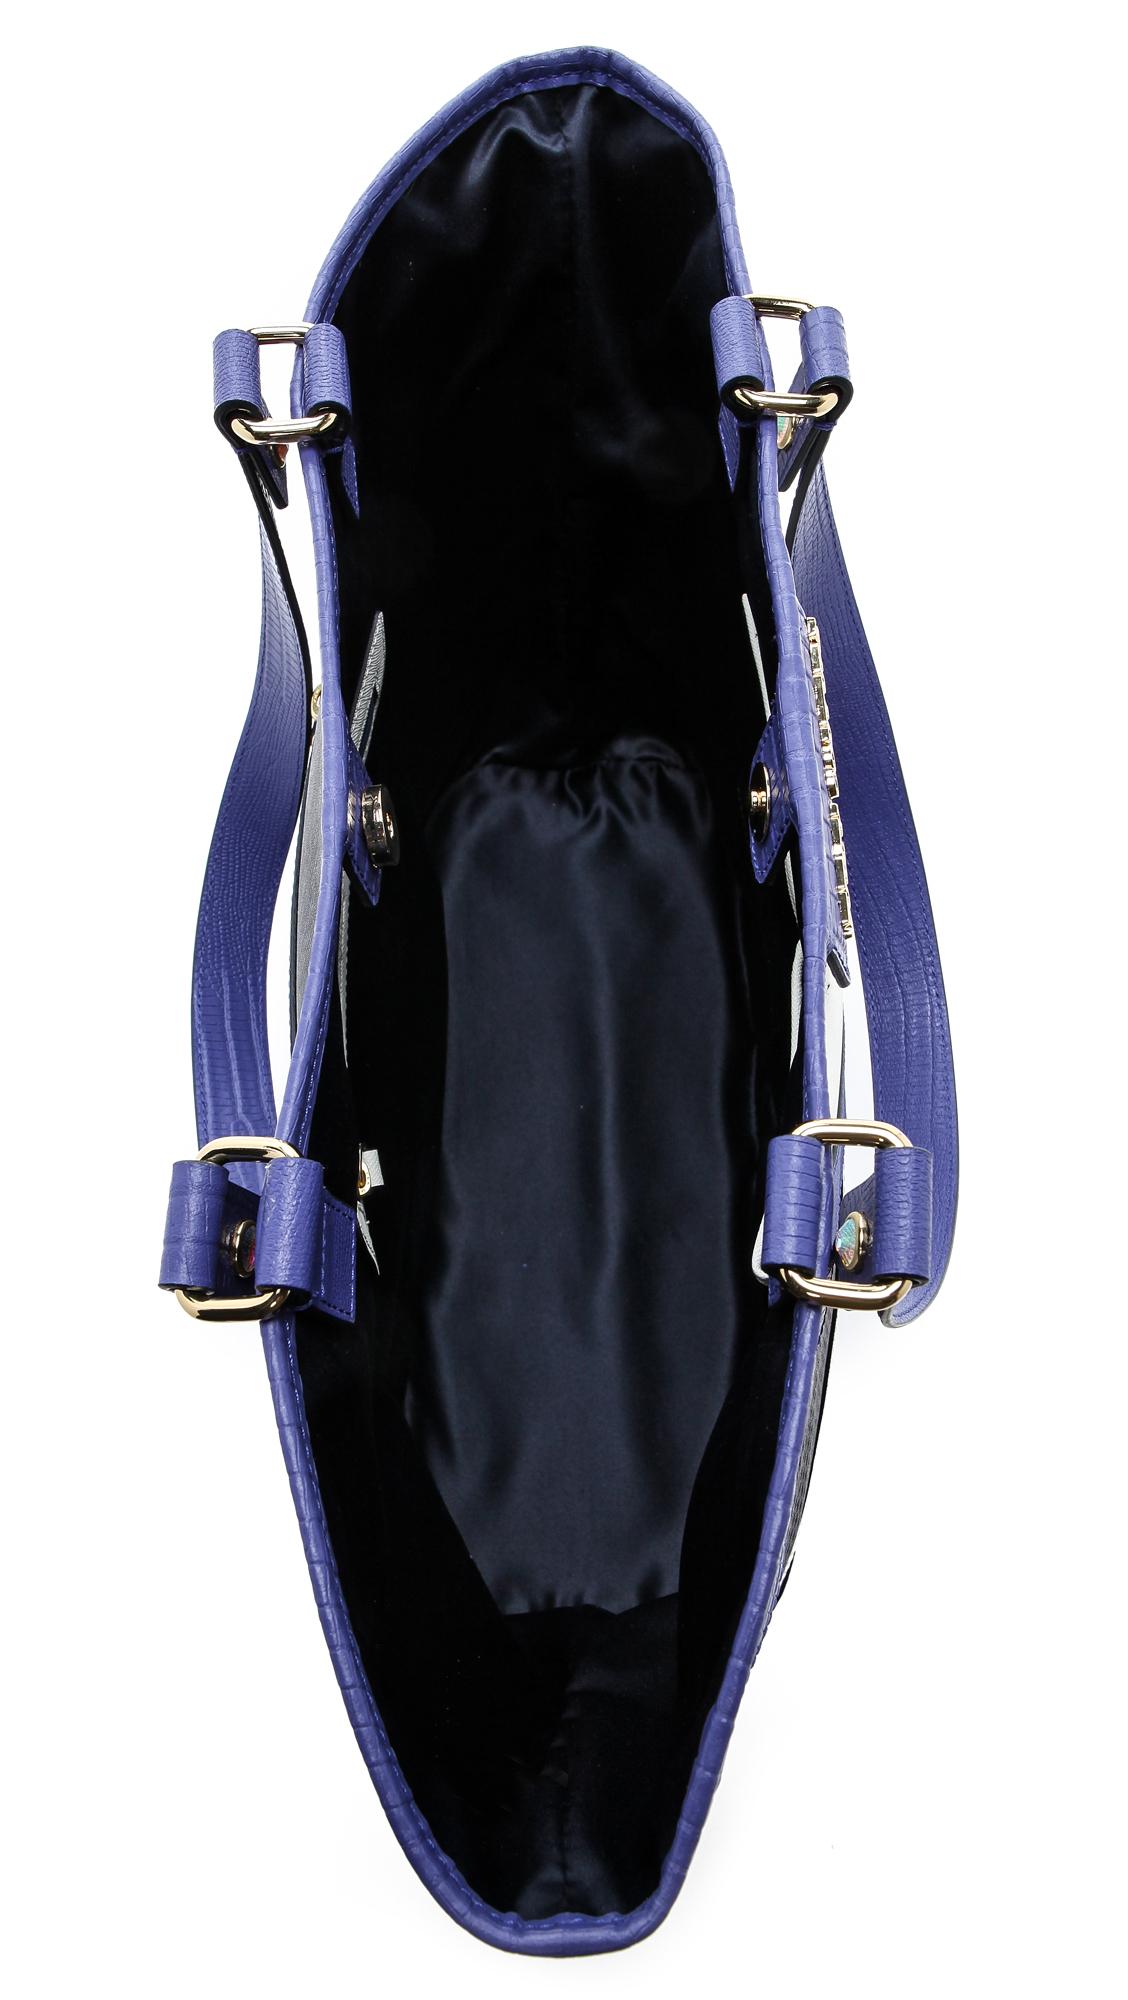 Juicy Couture Sierra Colorblock Tote in Blue